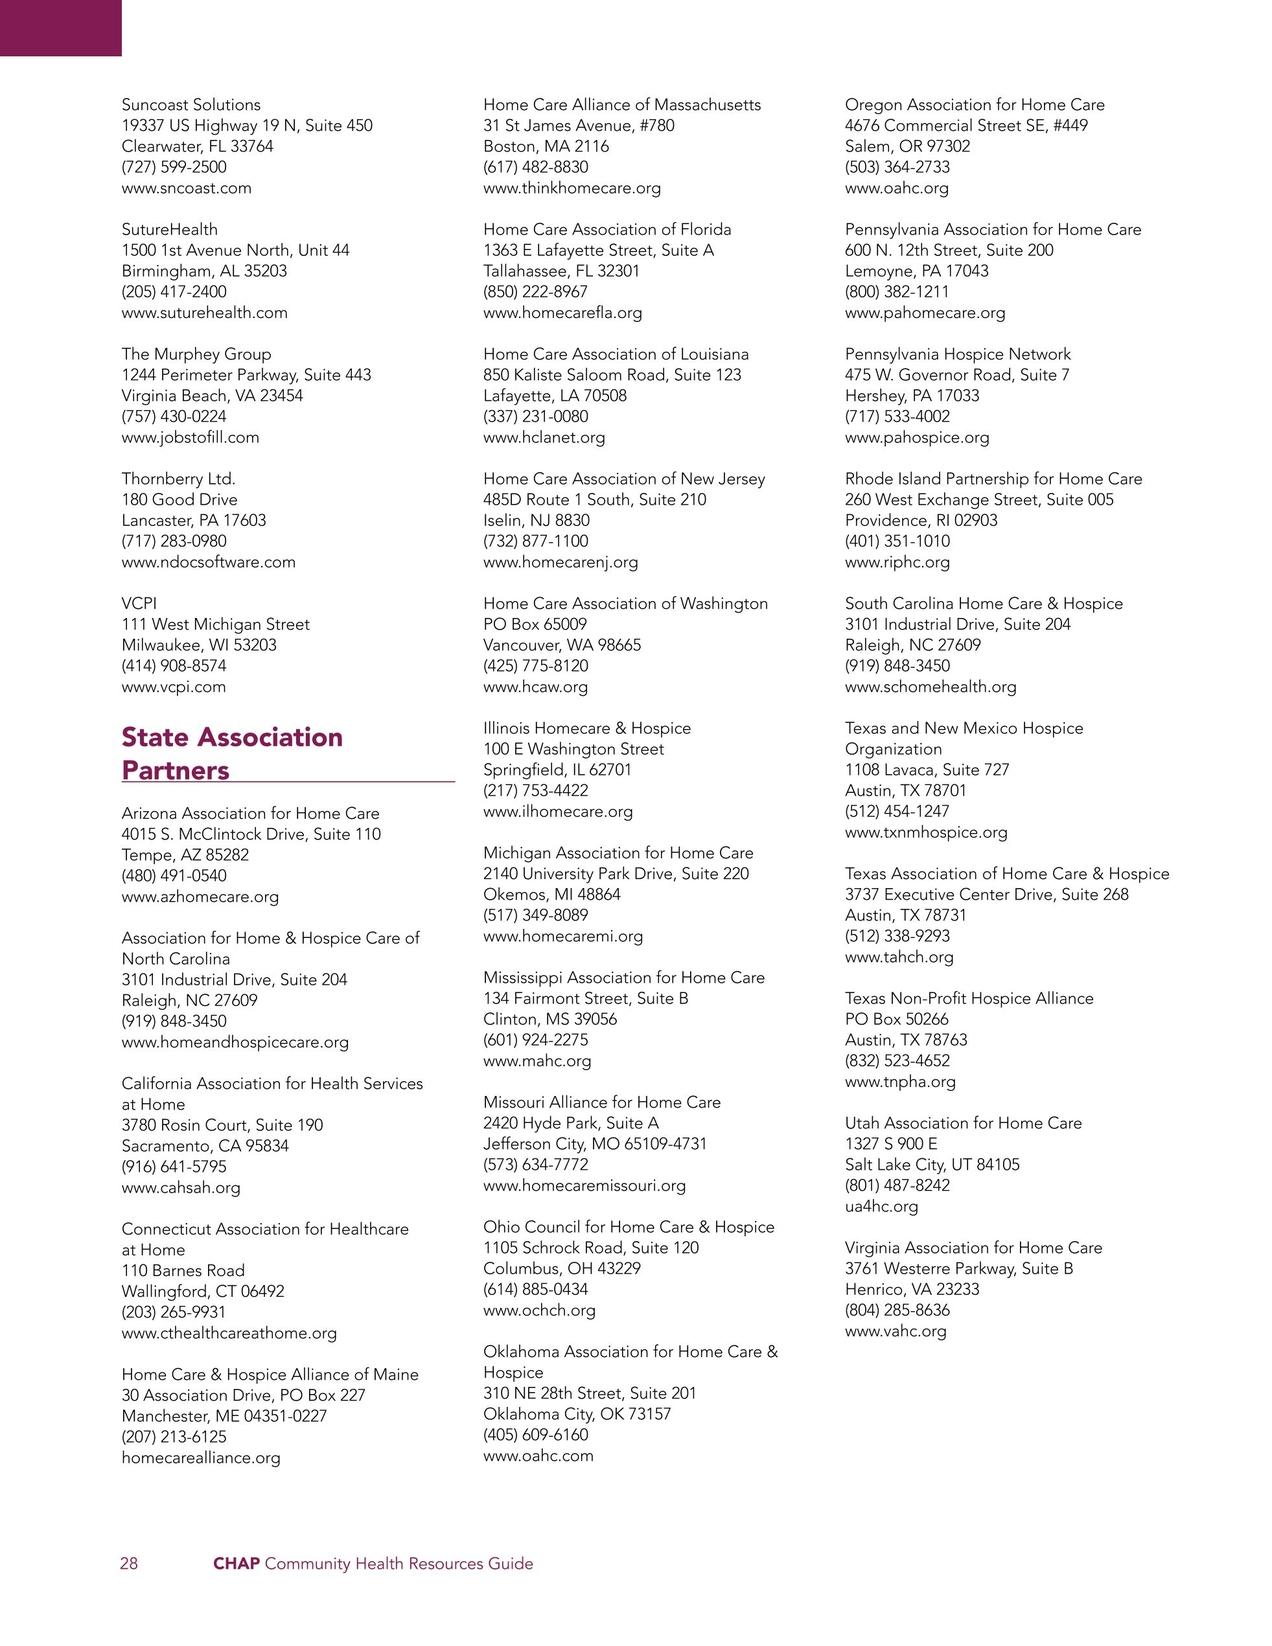 Chap Community Health Resource Directory